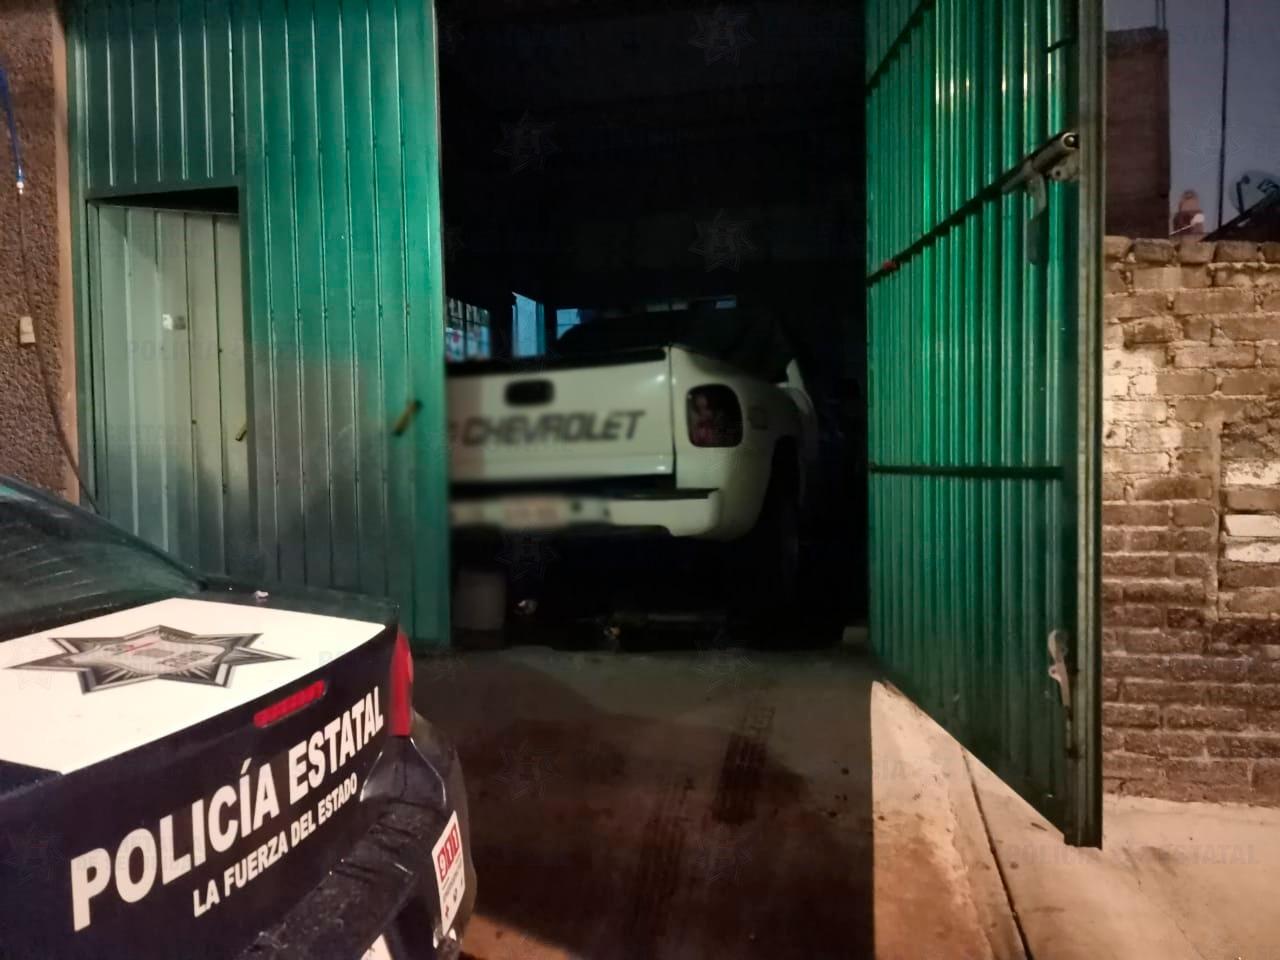 RESGUARDAN PREDIO DONDE SE LOCALIZÓ UN VEHÍCULO CON REPORTE DE ROBO